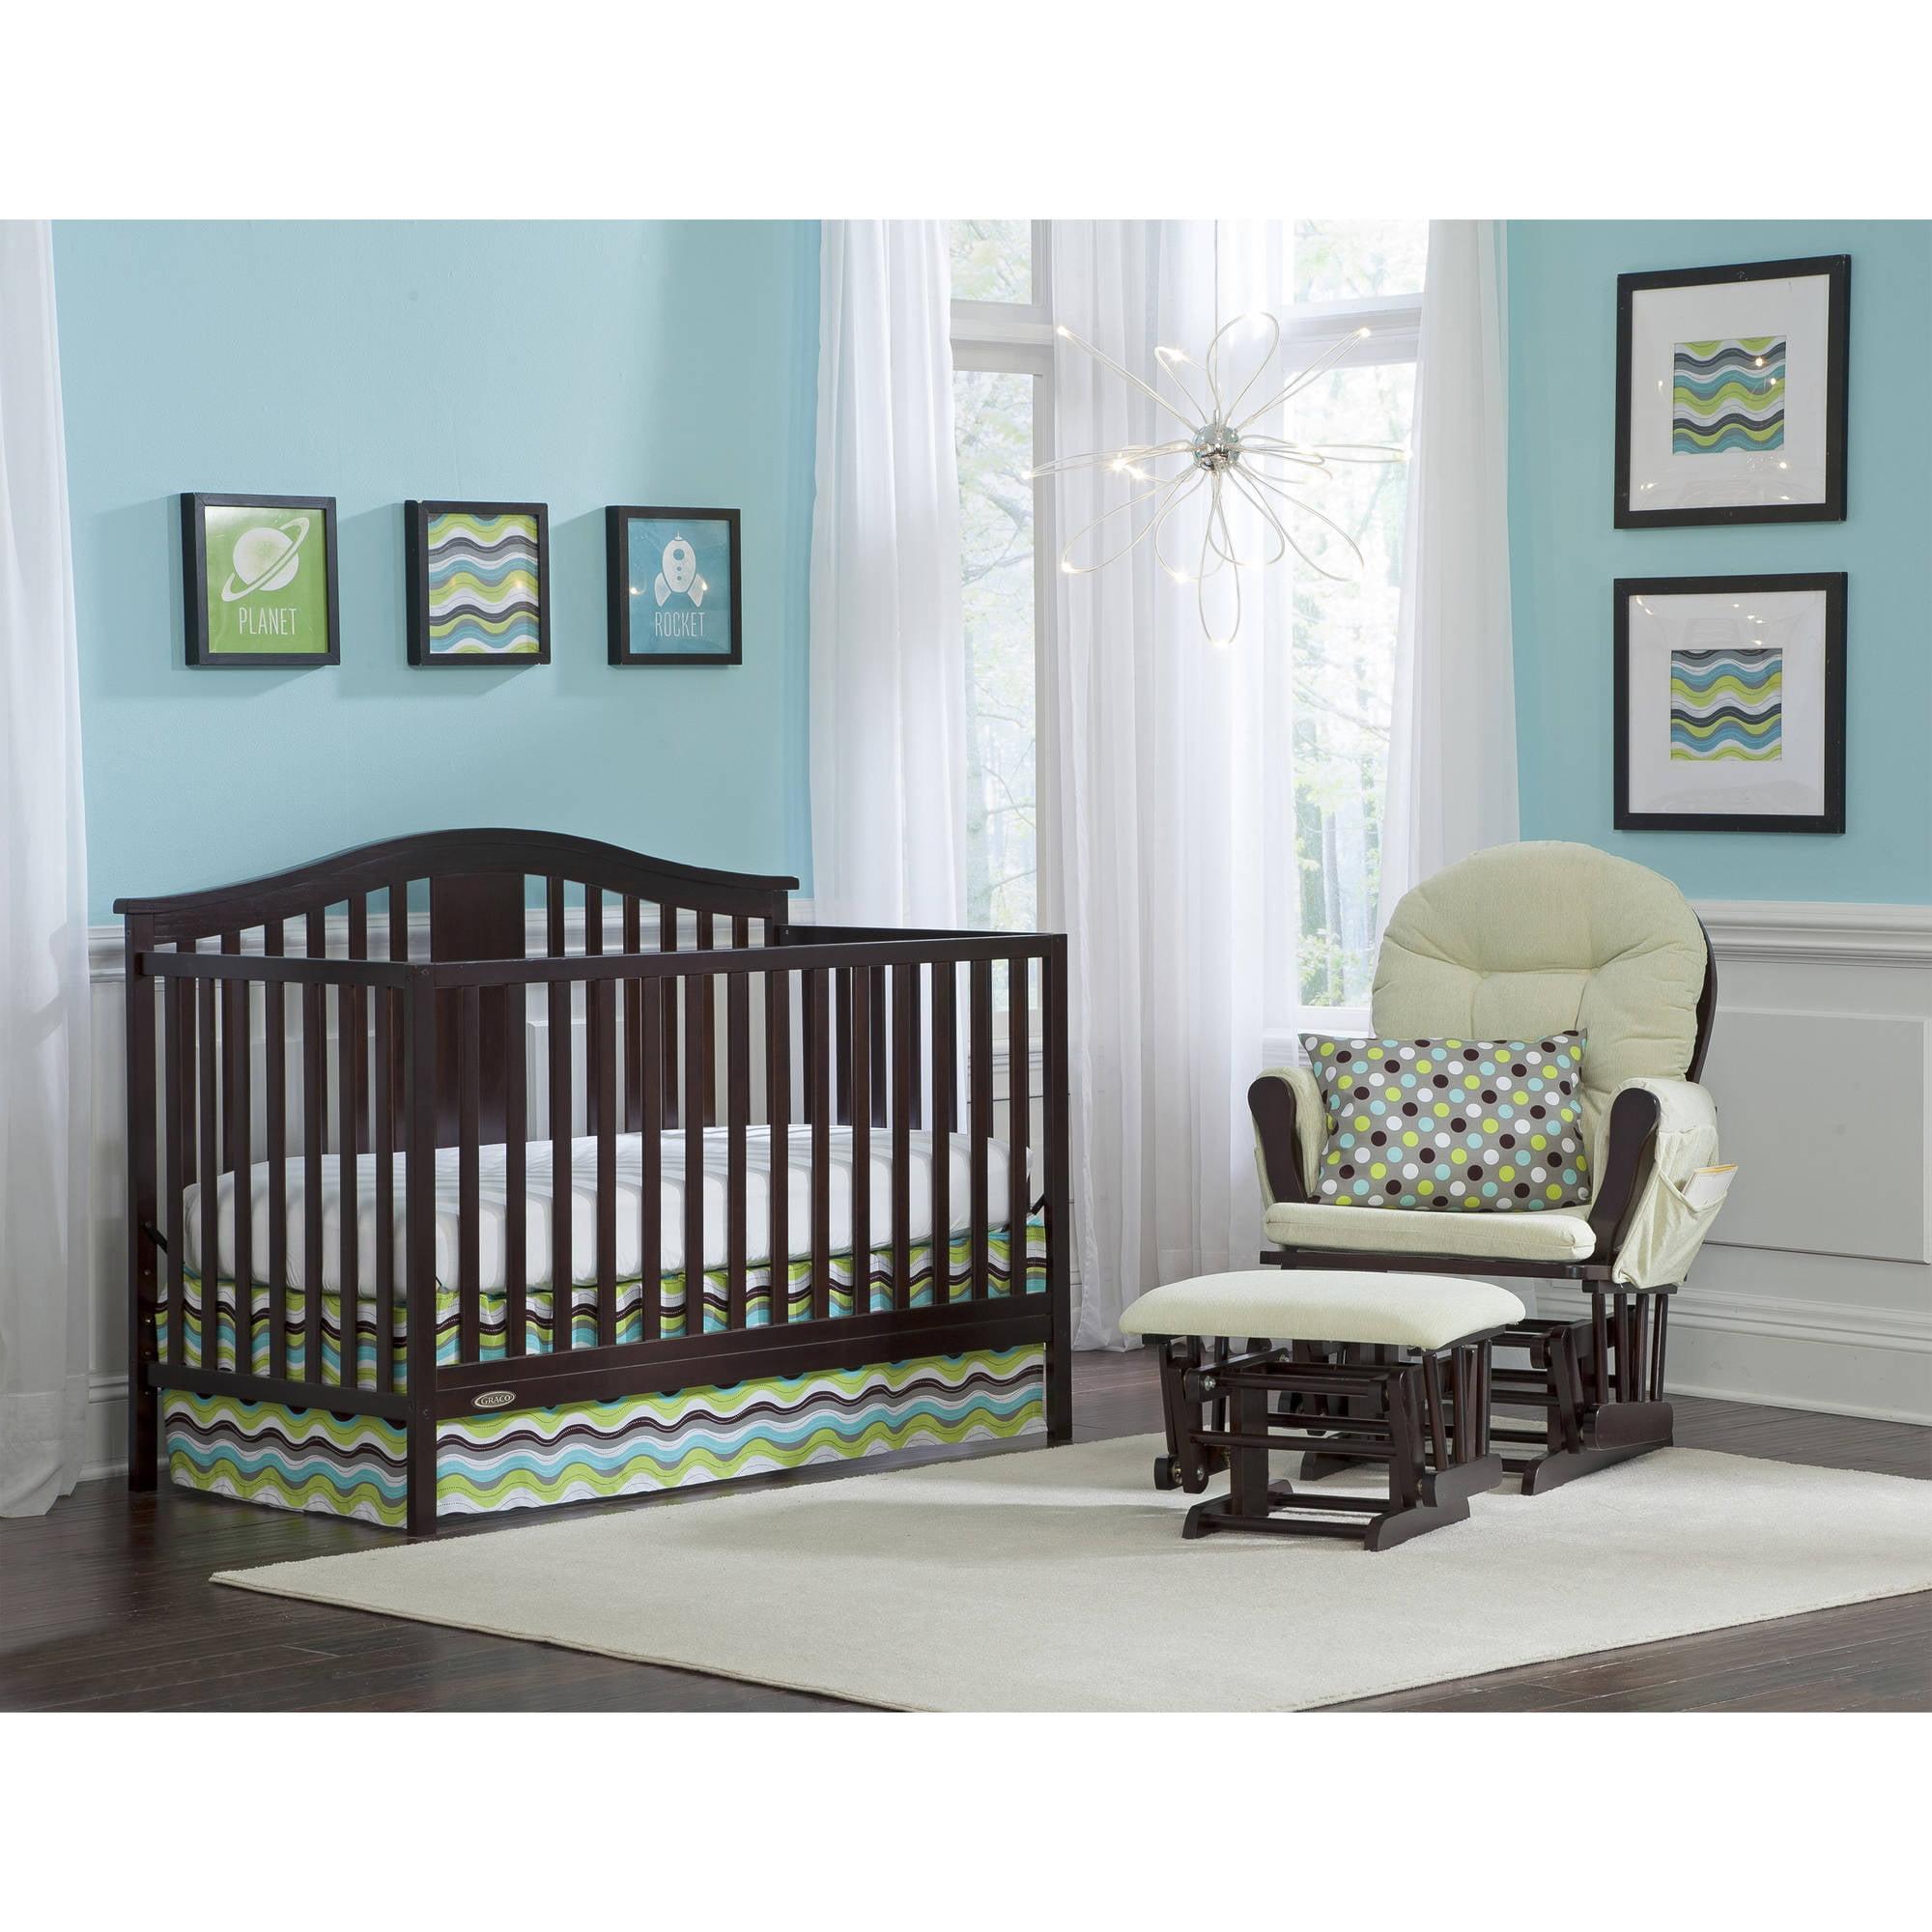 Graco Solano 4-in-1 Convertible Crib and Bonus Mattress, Multiple Colors